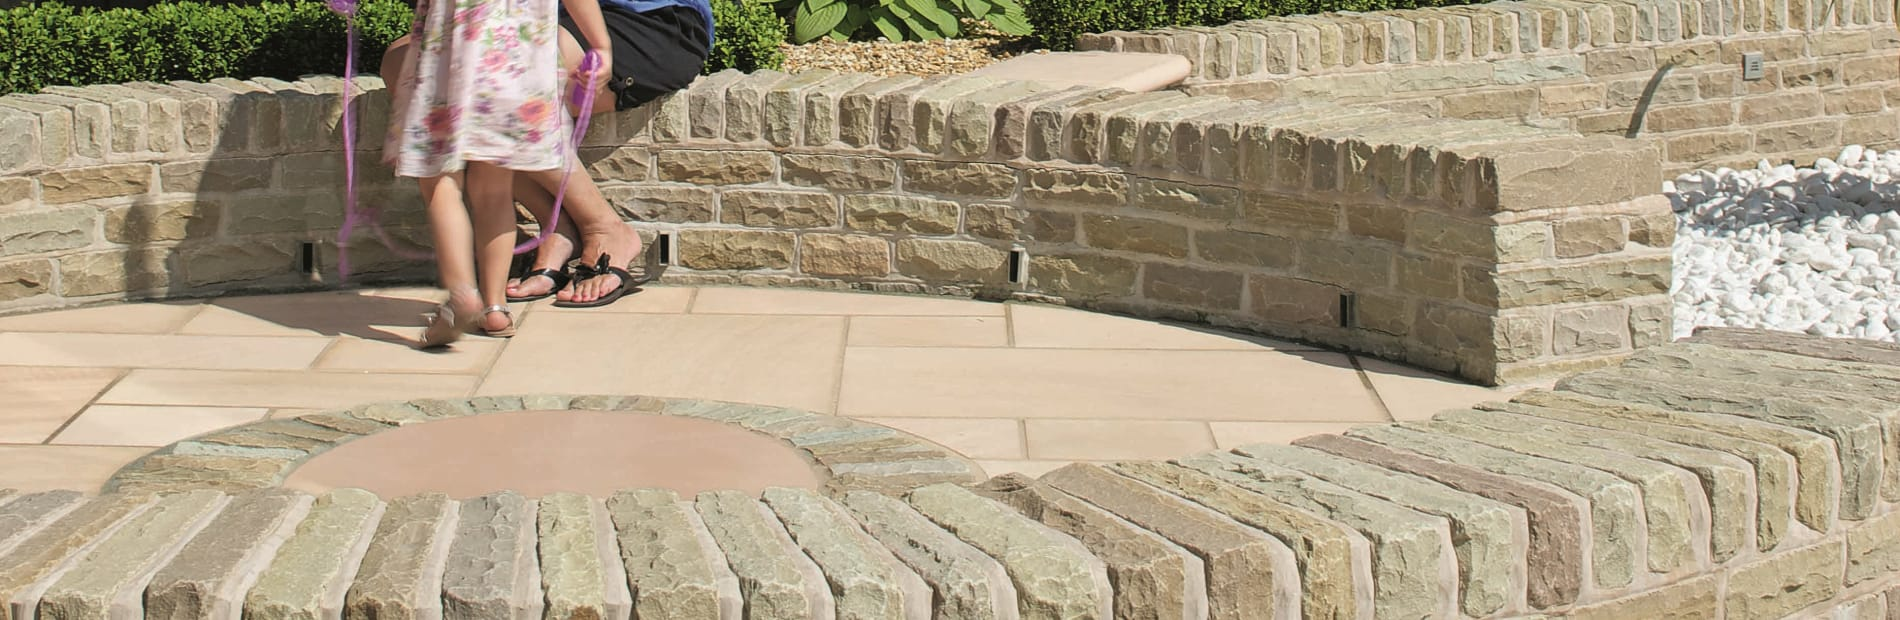 Fairstone Traditional Tumbled Walling hero image